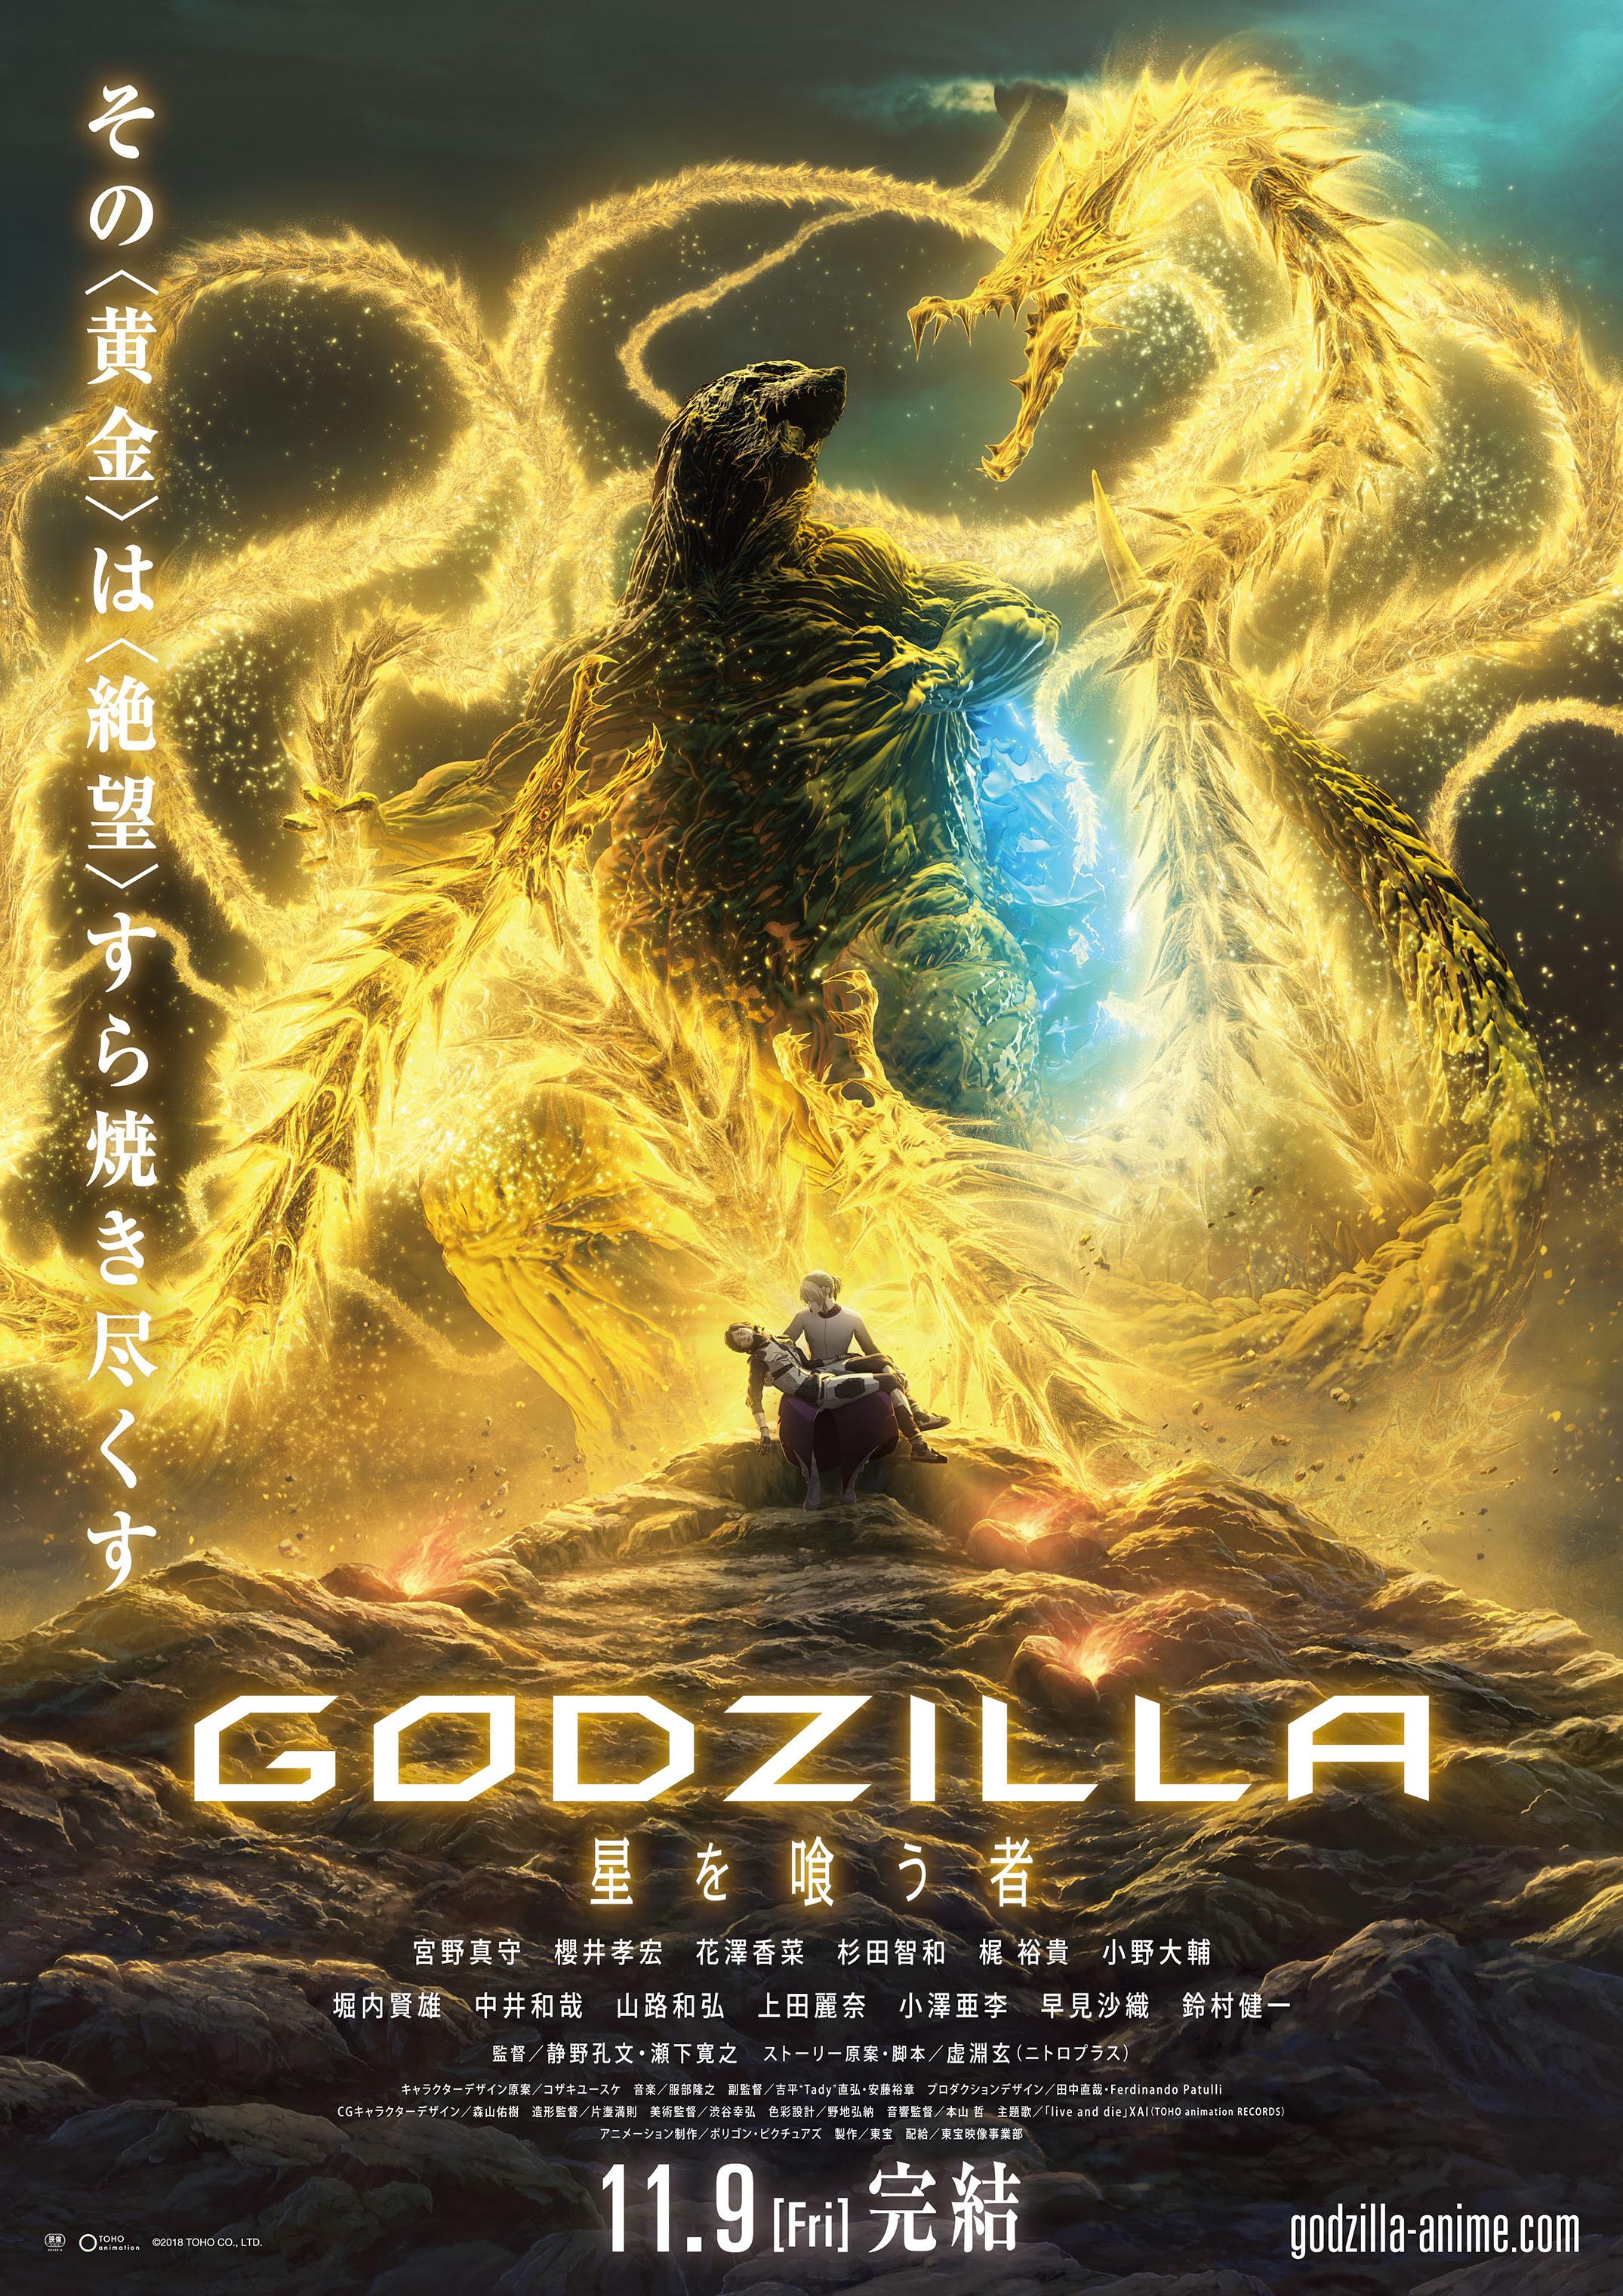 『GODZILLA 星を喰う者』 (C)2018 TOHO CO., LTD.